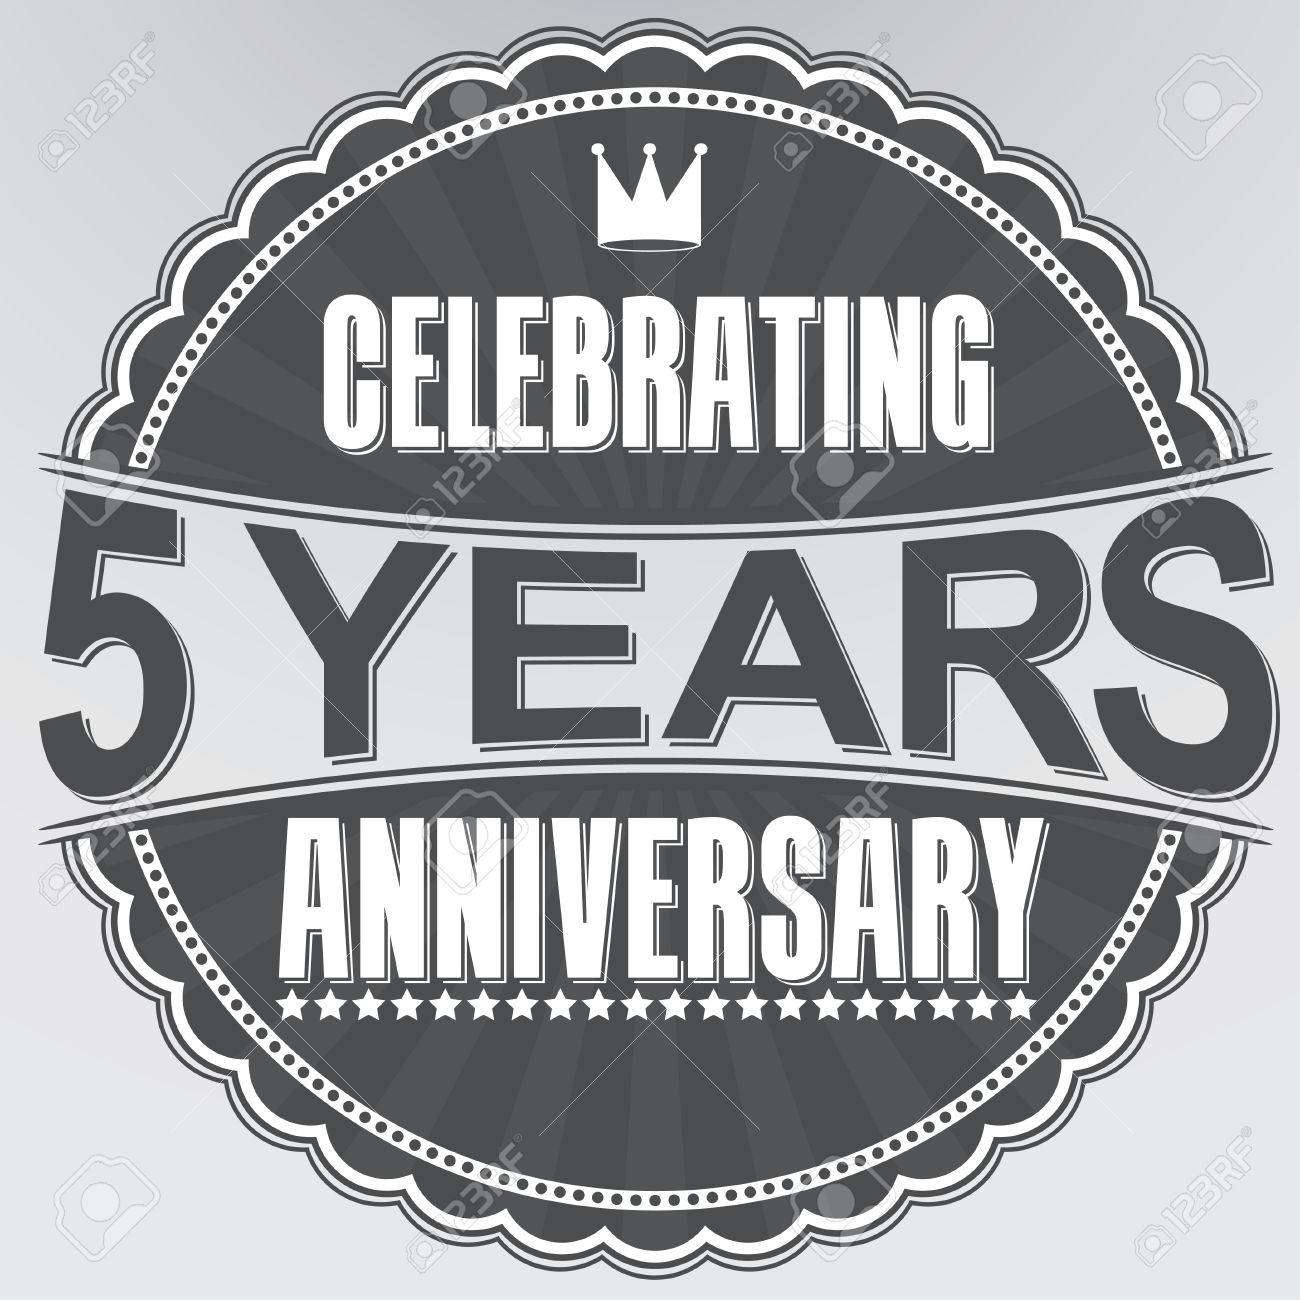 Celebrating 5 years anniversary retro label vector illustration celebrating 5 years anniversary retro label vector illustration stock vector 35849655 biocorpaavc Choice Image